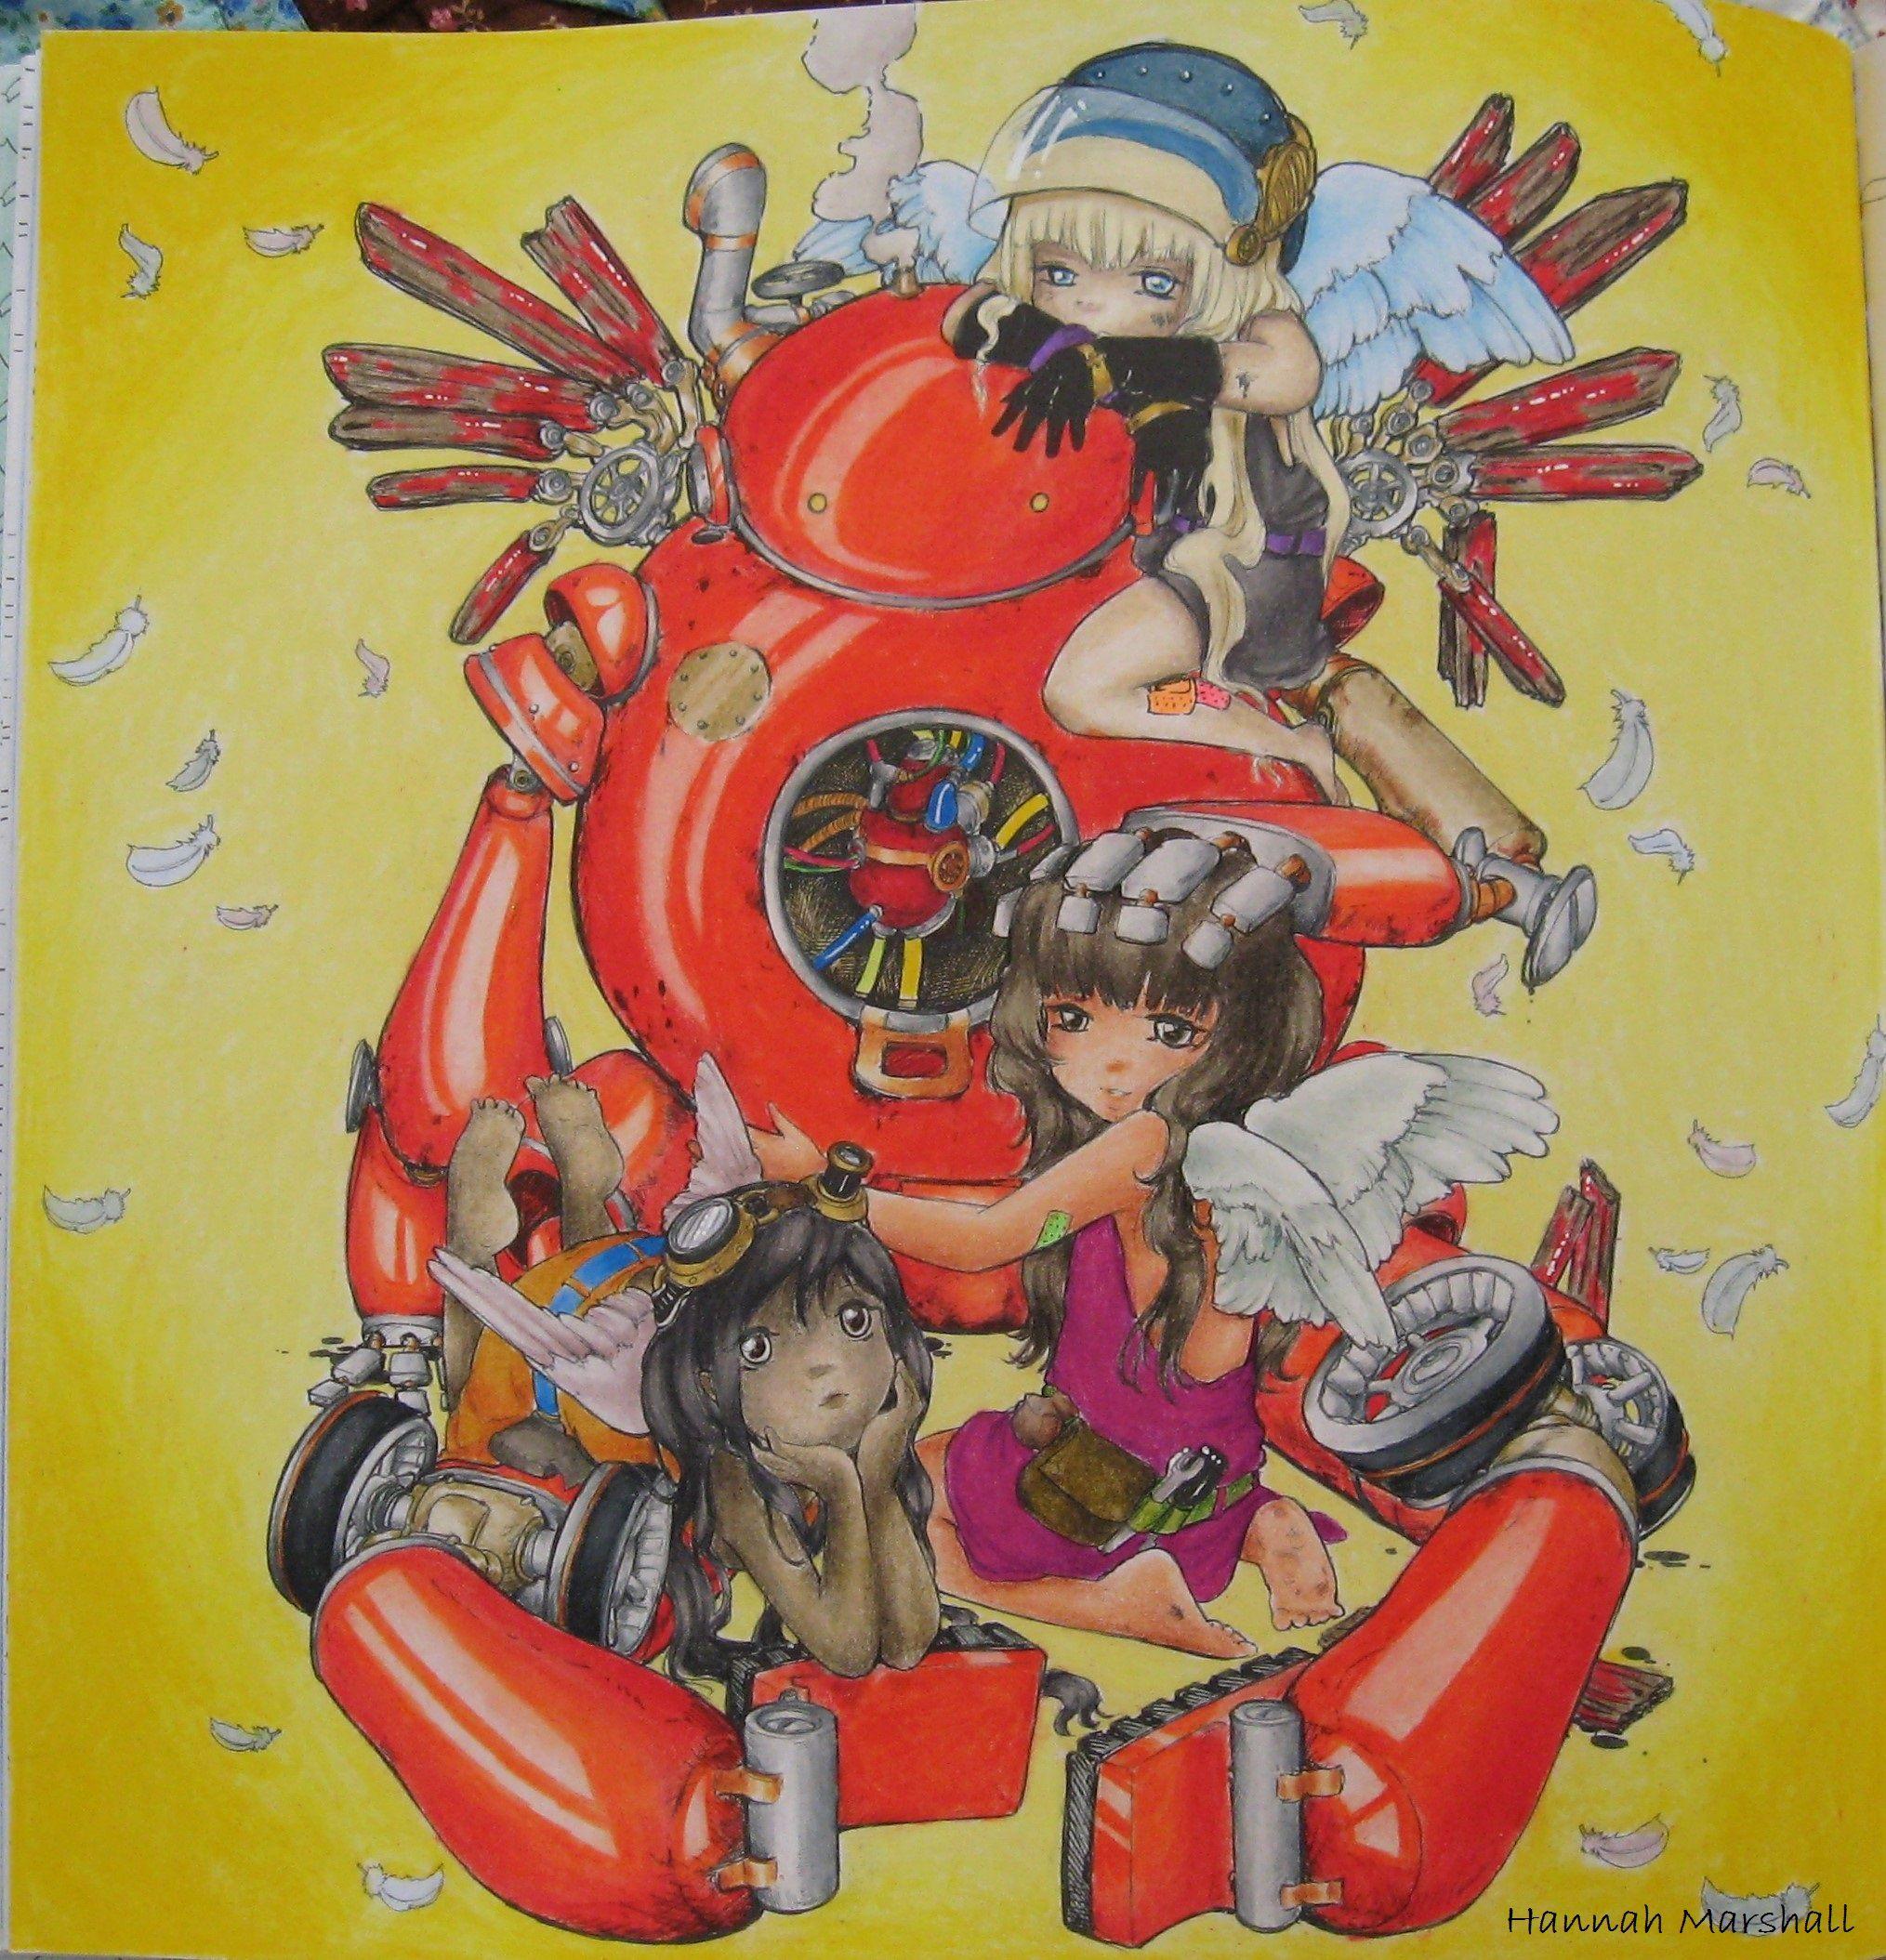 Pop Manga Coloring Book By Camilla D Errico Colored By Hanamarma Manga Coloring Book Camilla D Errico Coloring Books